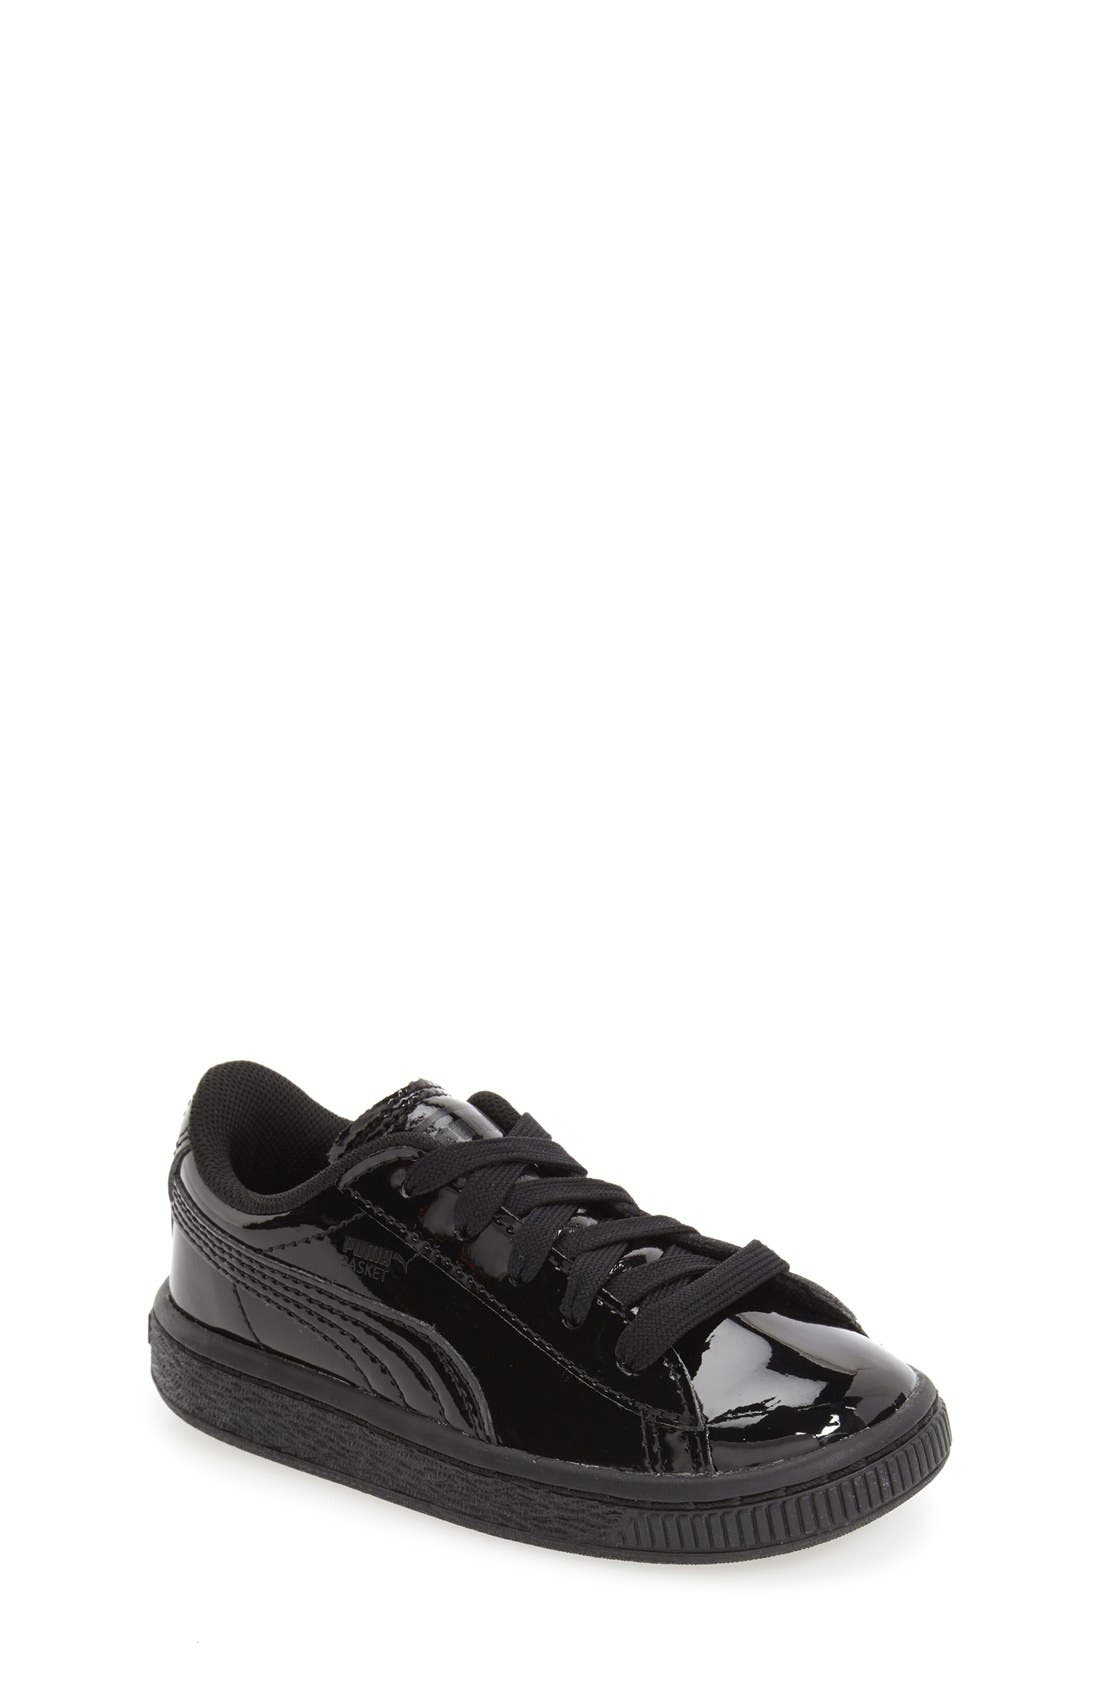 Main Image - PUMA 'Basket Classic' Shoe (Baby, Walker & Toddler)